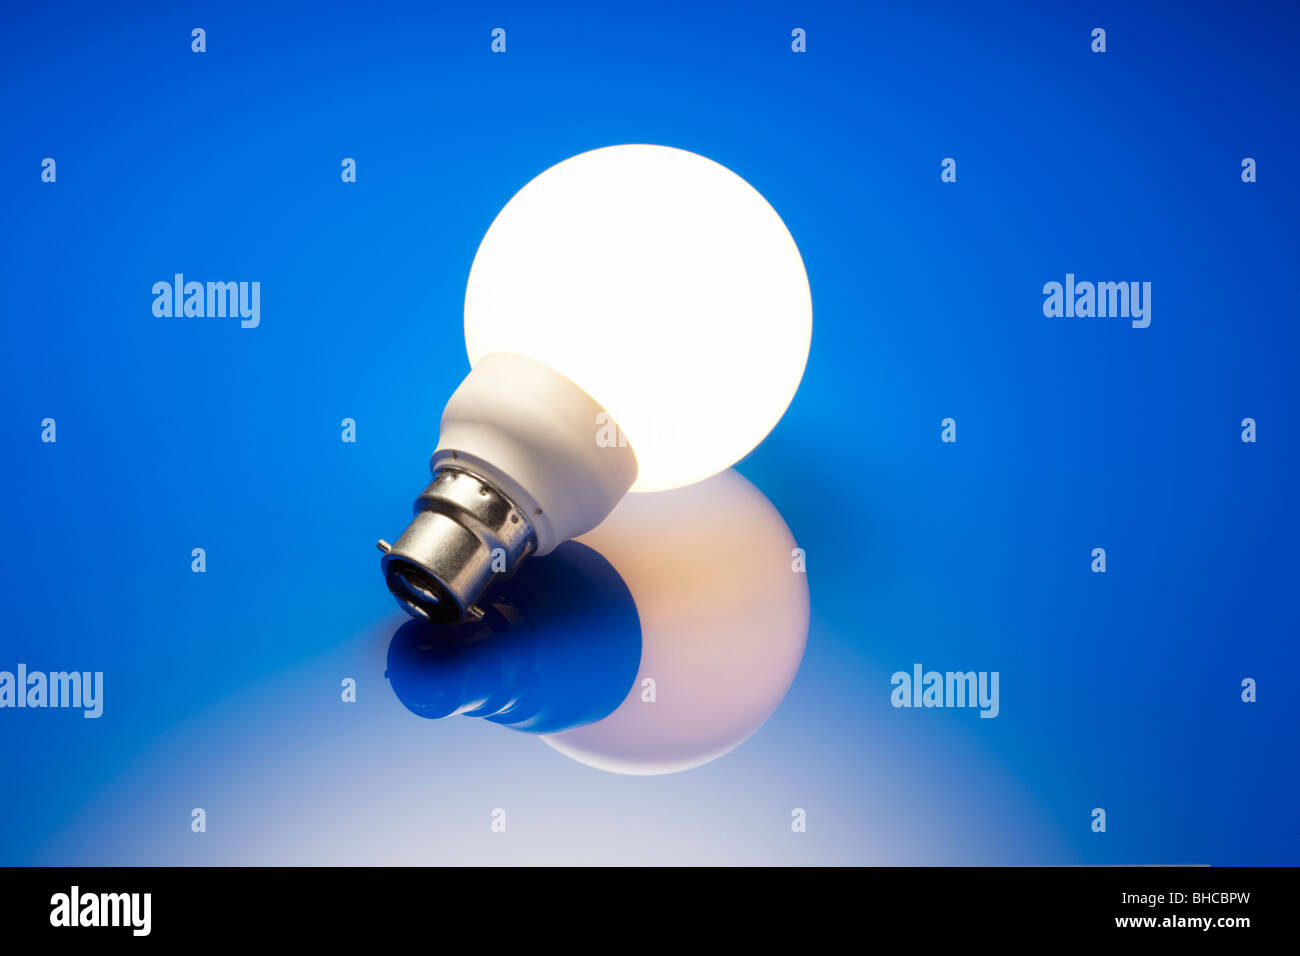 Energiesparlampe, beleuchtet Stockbild